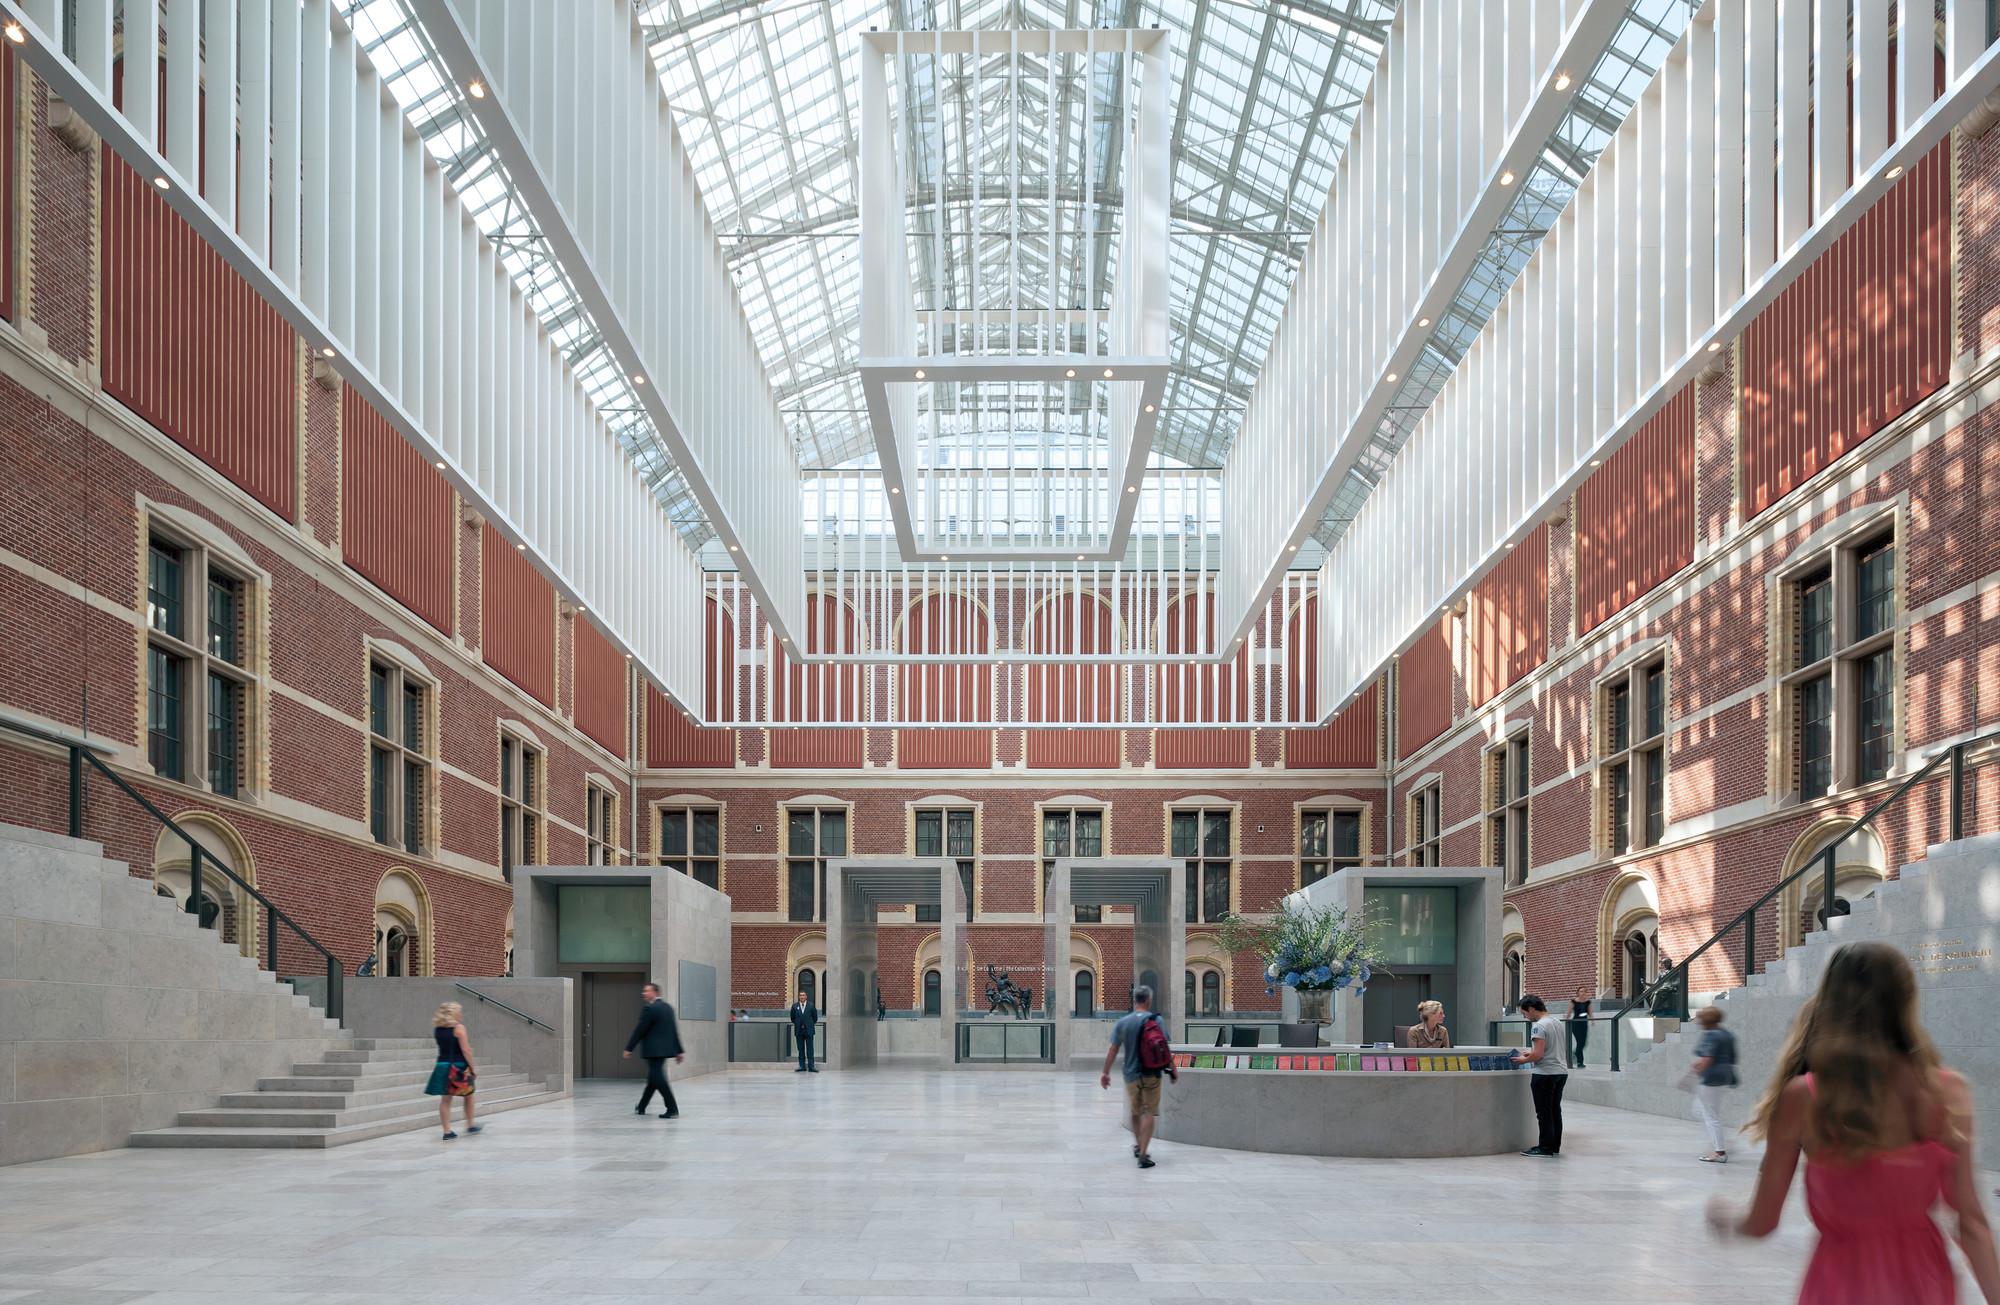 Rijksmuseum. Imagen © Duccio Malagamba